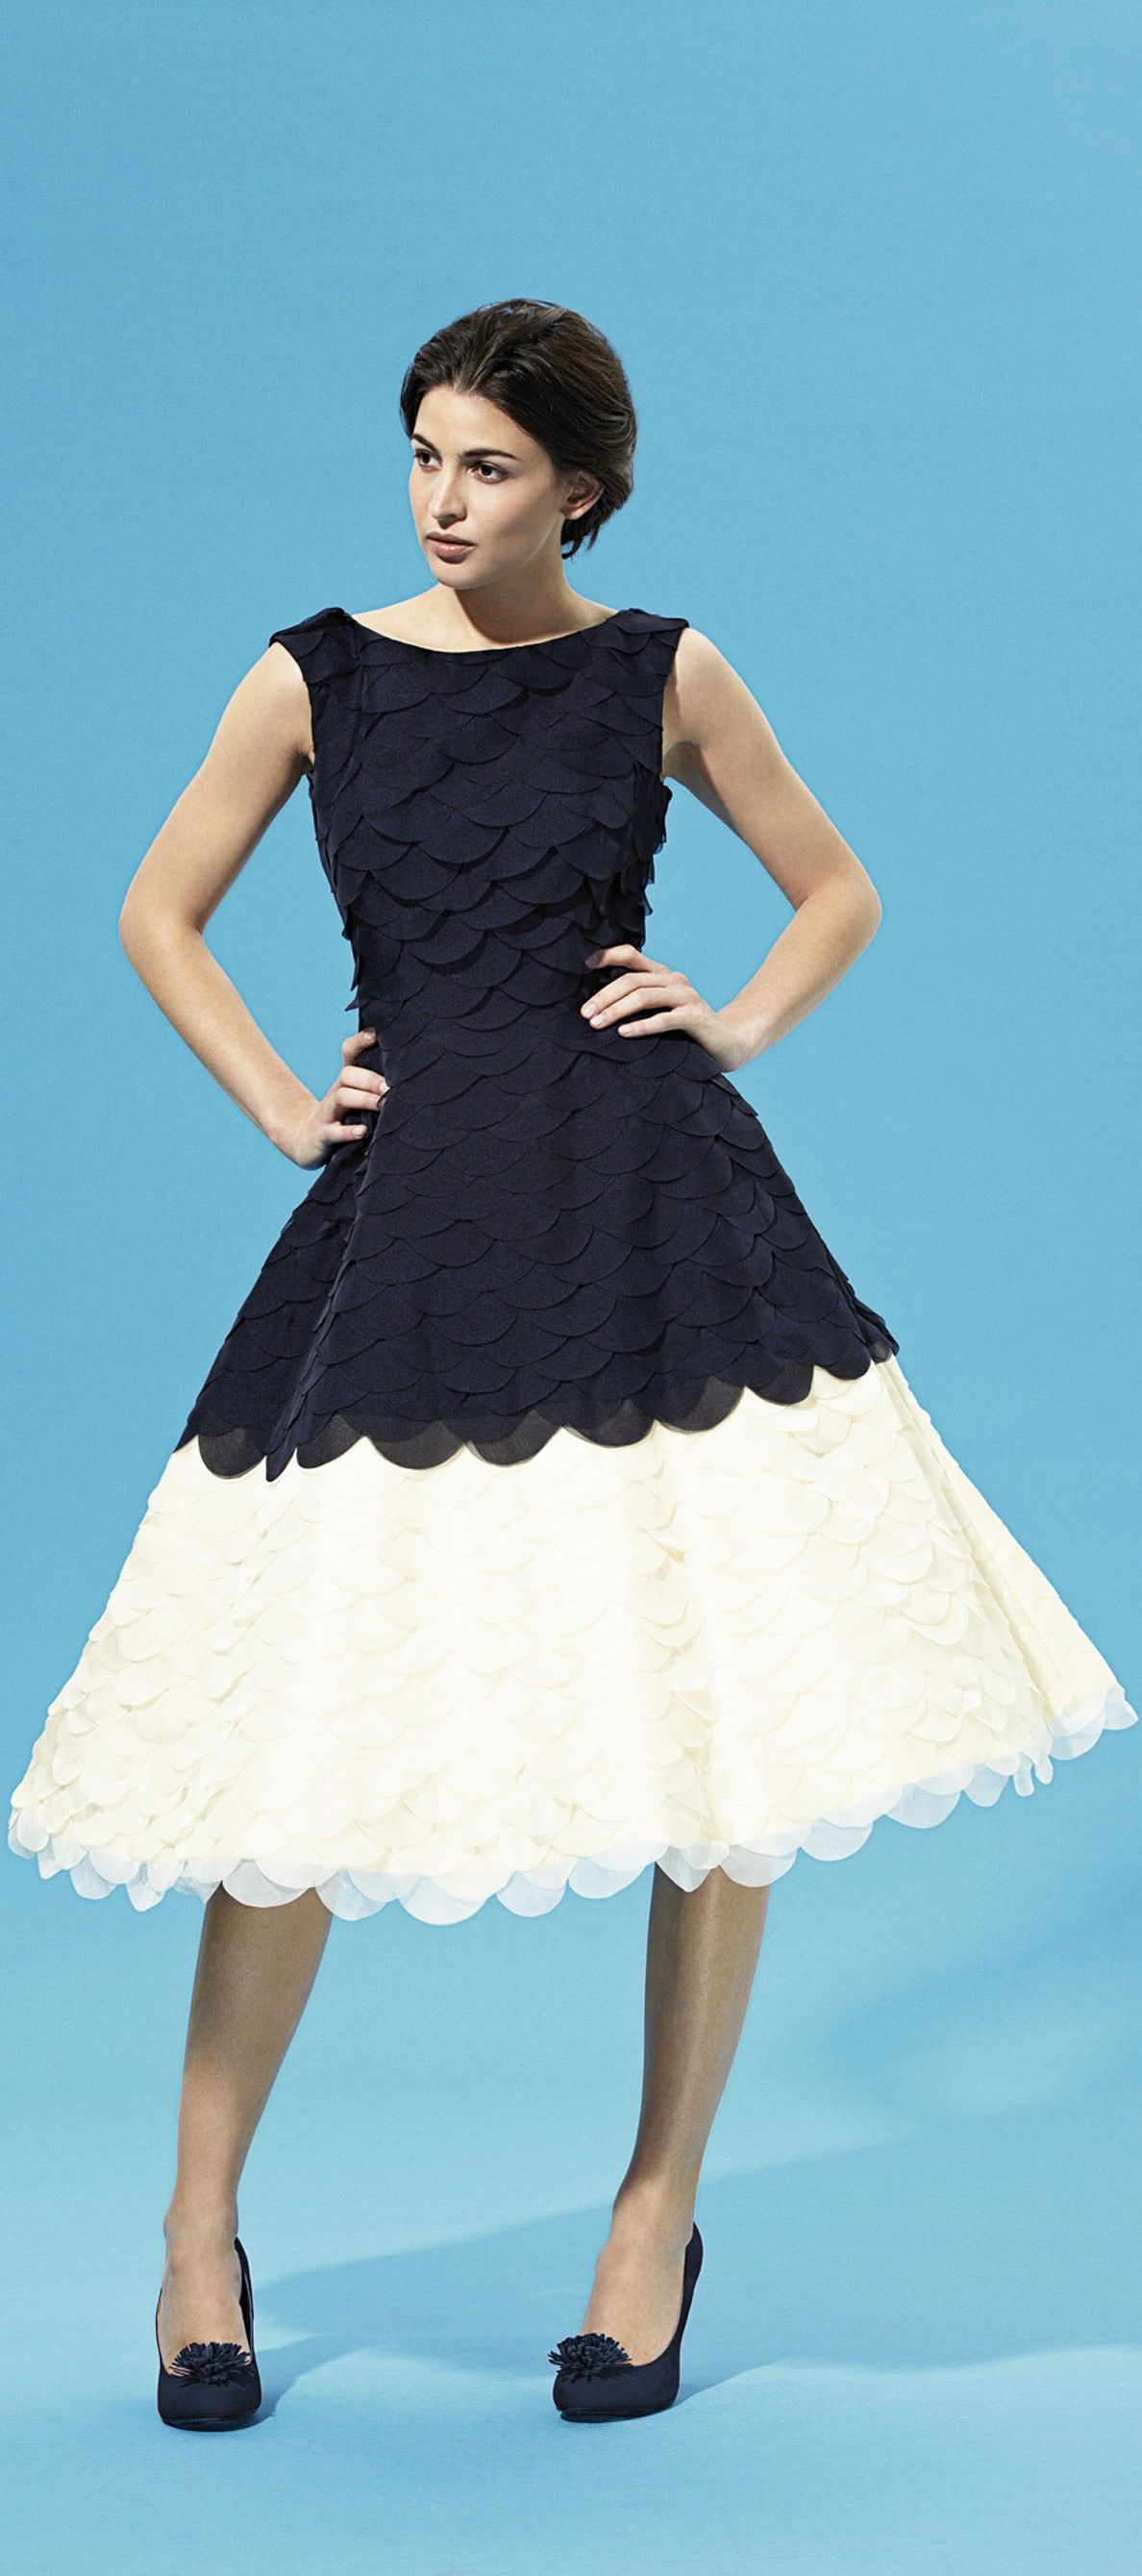 Contemporary Debenhams Bridal Gowns Images - All Wedding Dresses ...